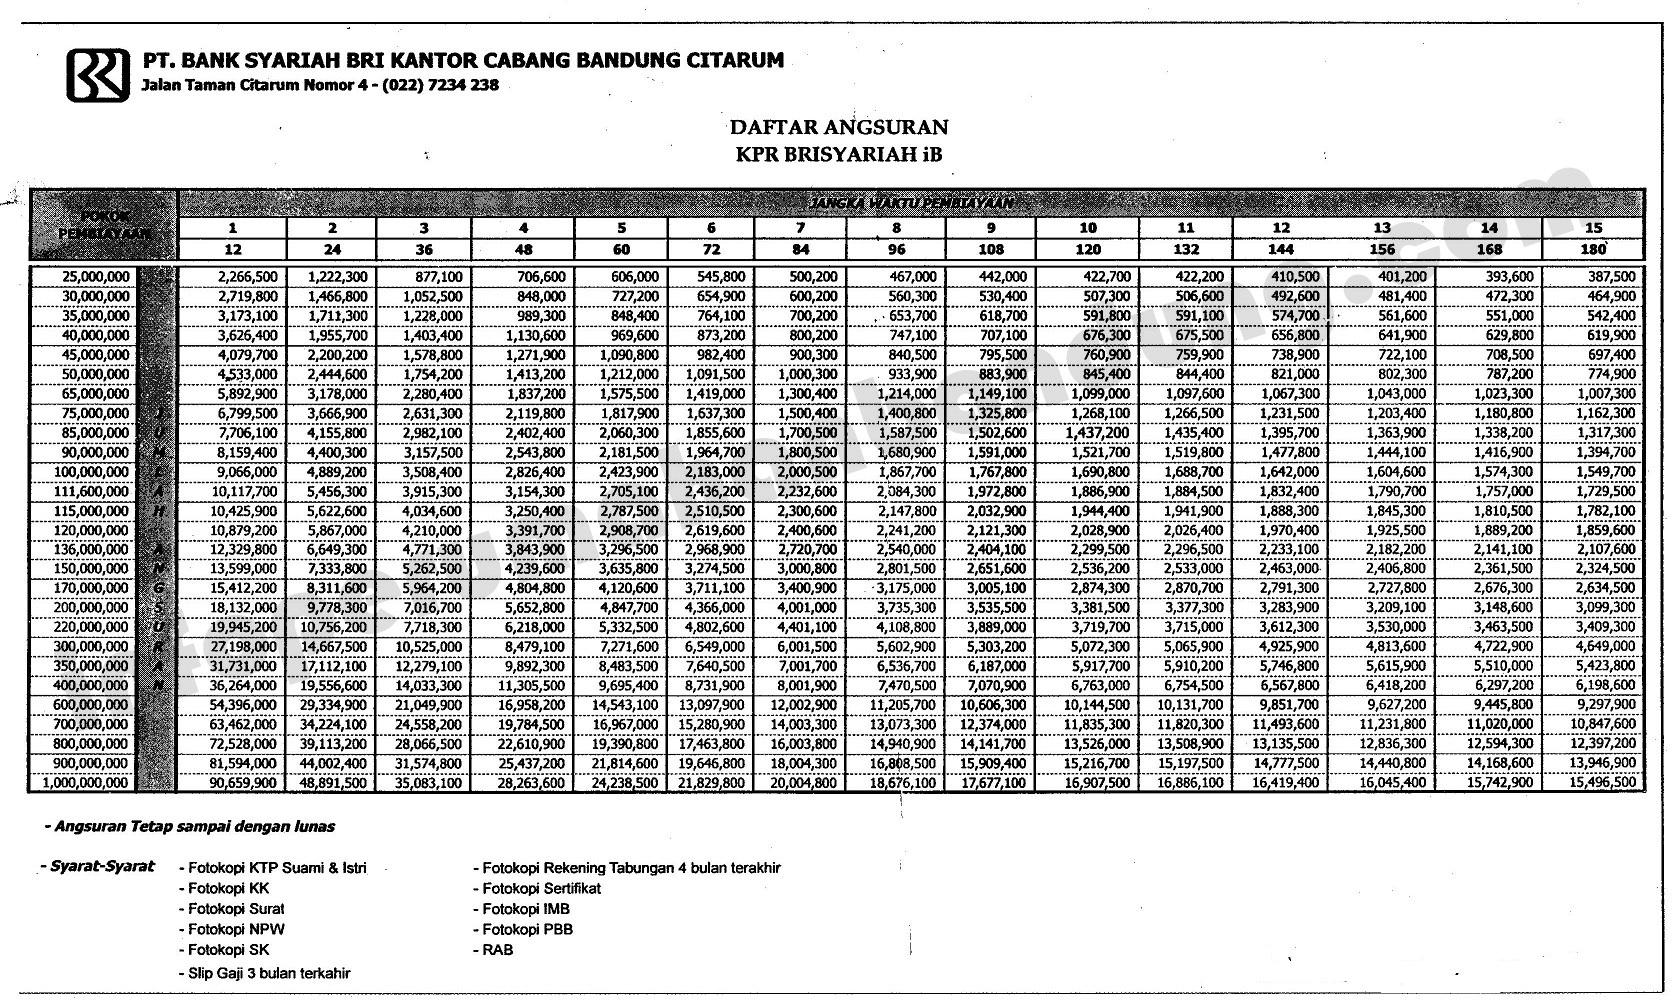 Tabel Cicilan Kpr Bri Syariah 2014 Info Perumahan Bandung